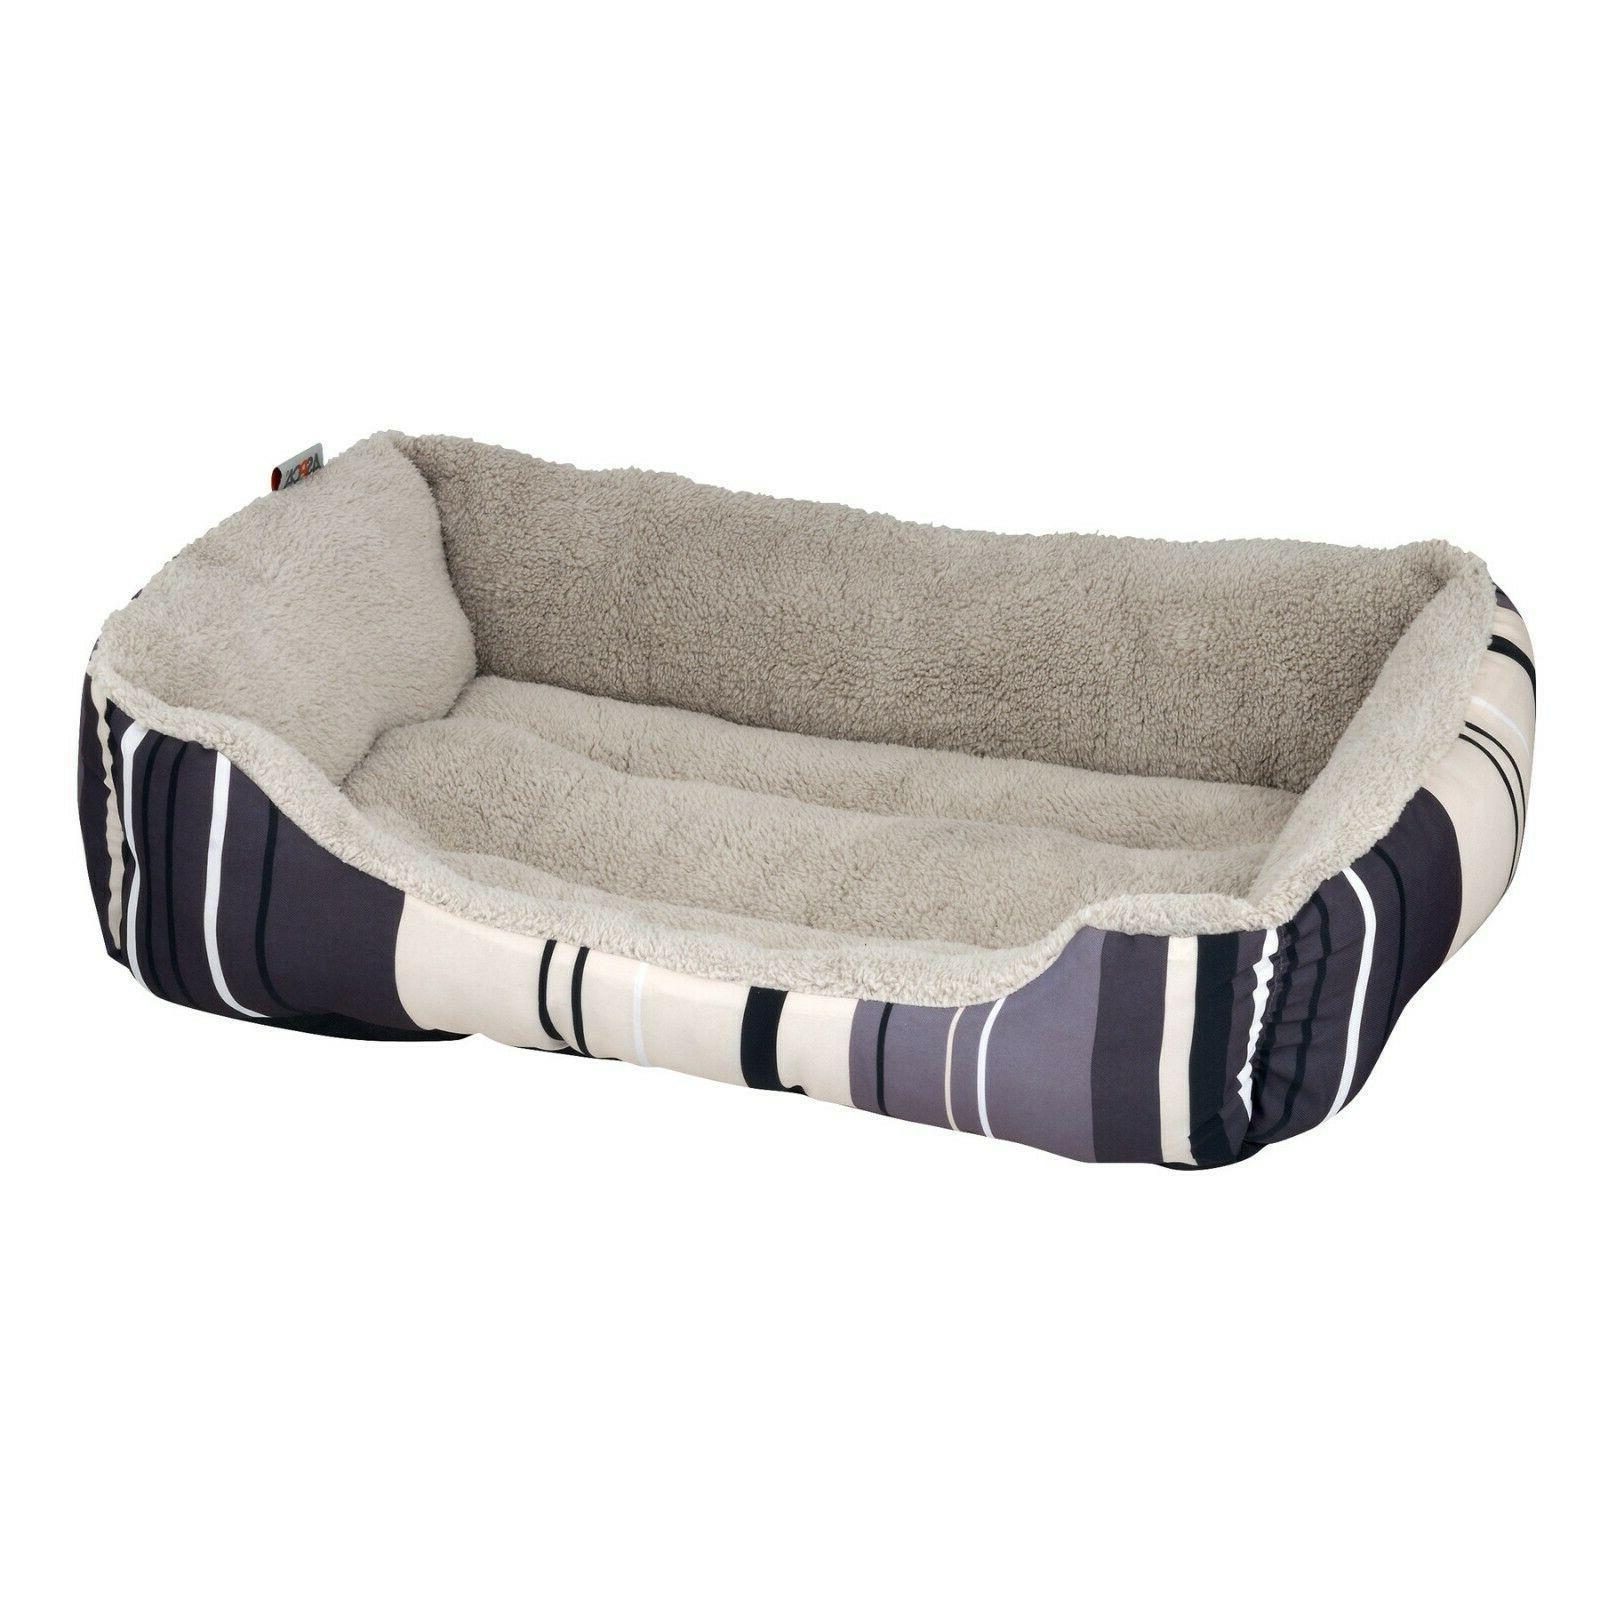 & Pet Bed, Medium,